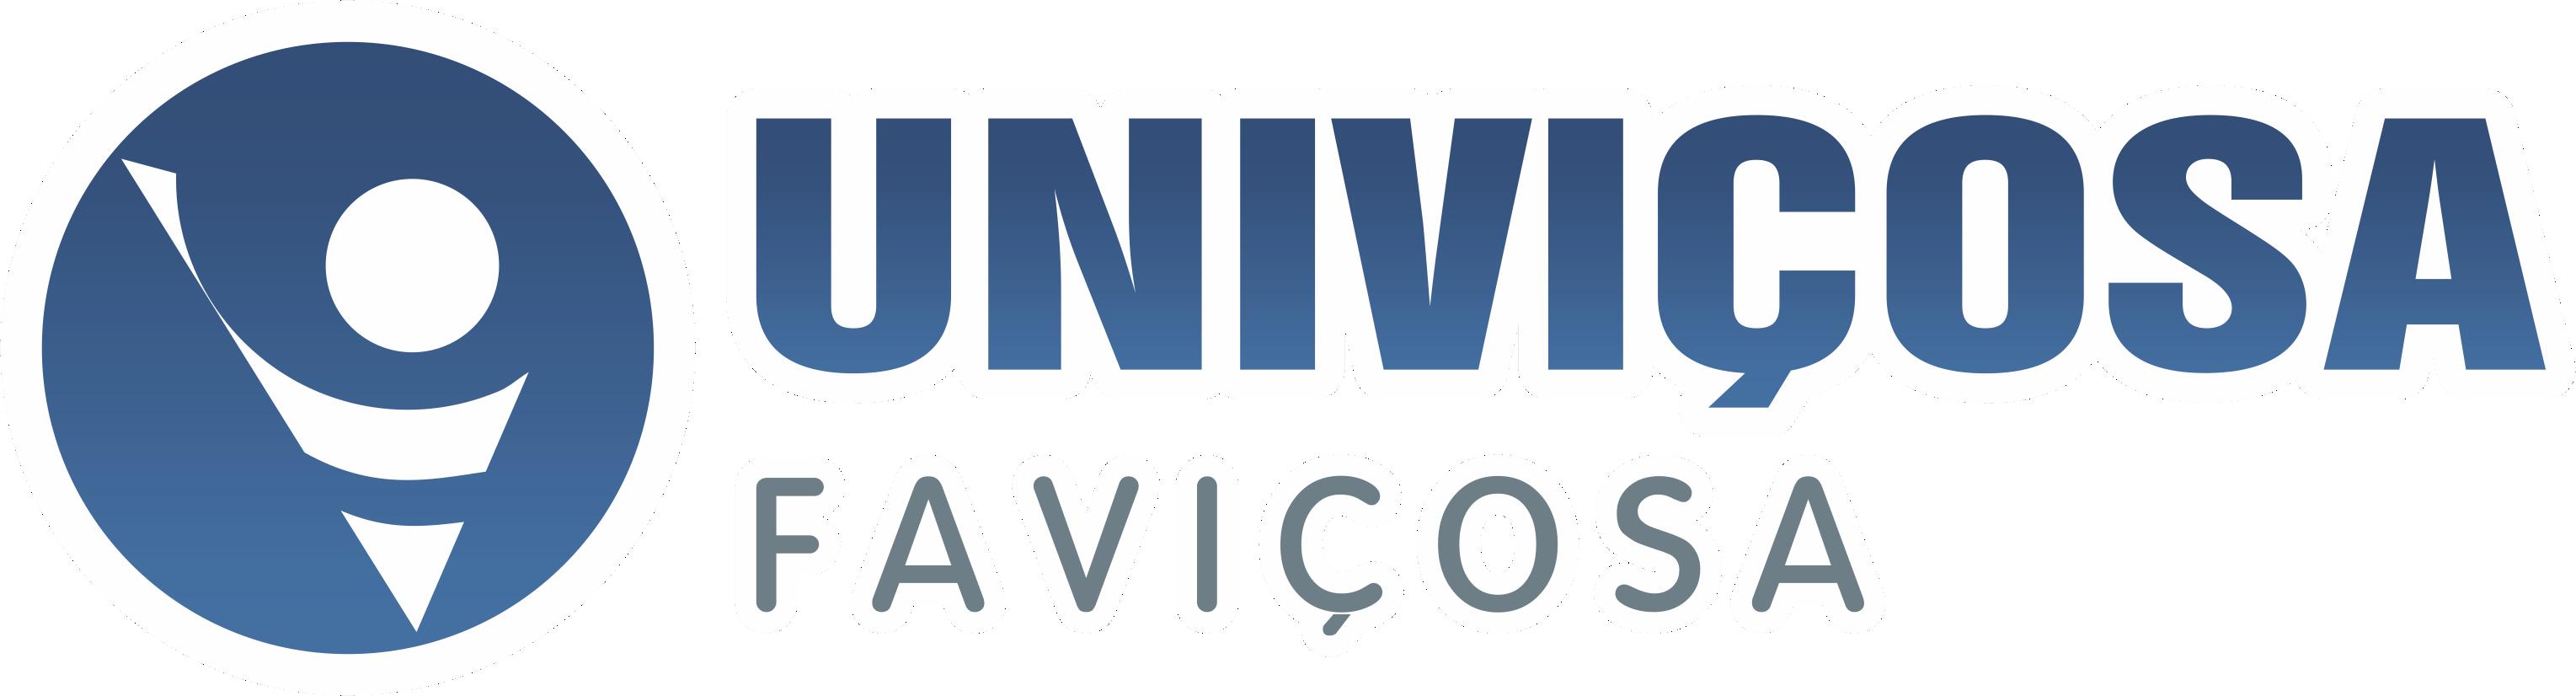 https://www.caedjus.com/wp-content/uploads/2021/03/univicosa.png